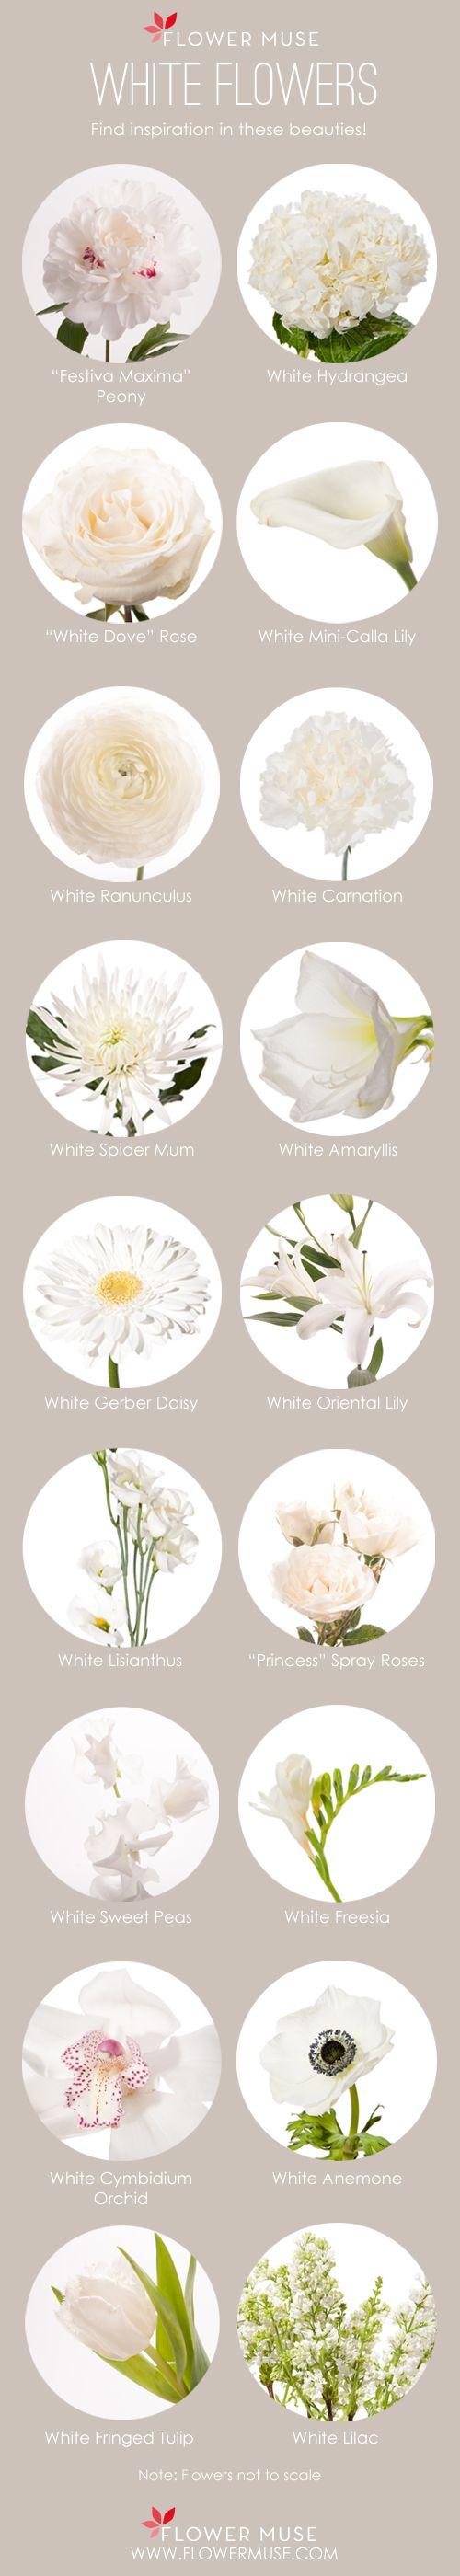 111 Best FLOWERS White Ivory Cream Images On Pinterest